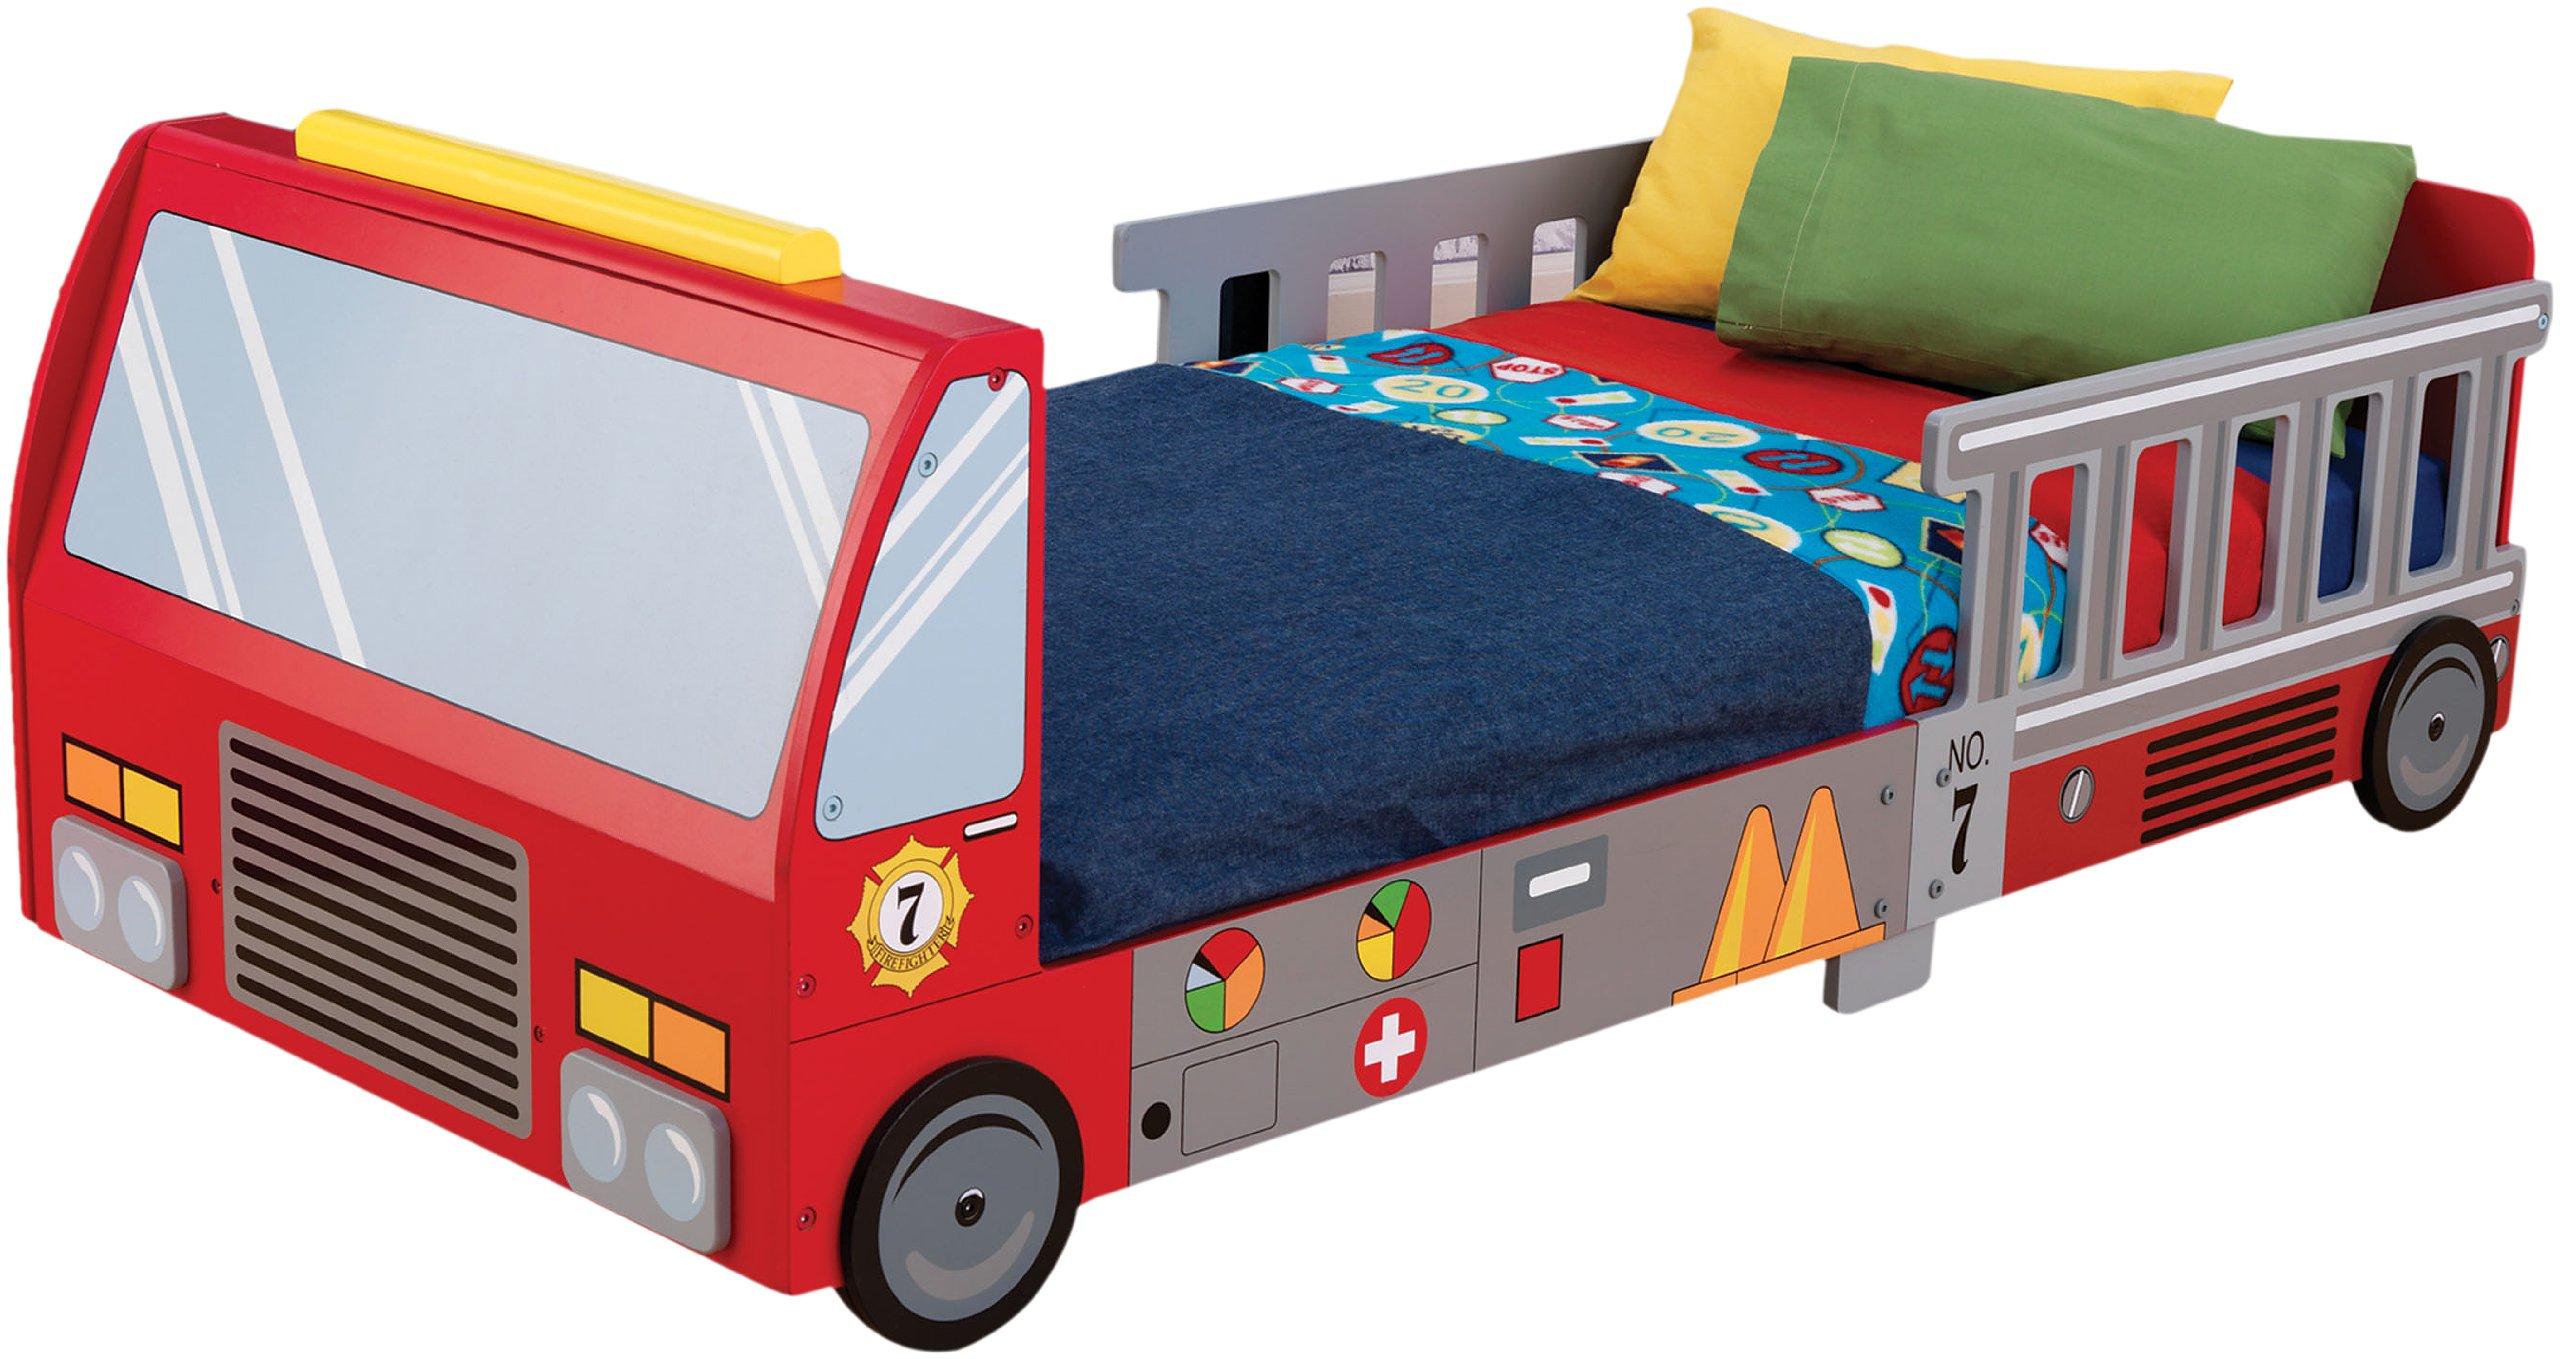 KidKraft Fire Truck Toddler Bed by KidKraft